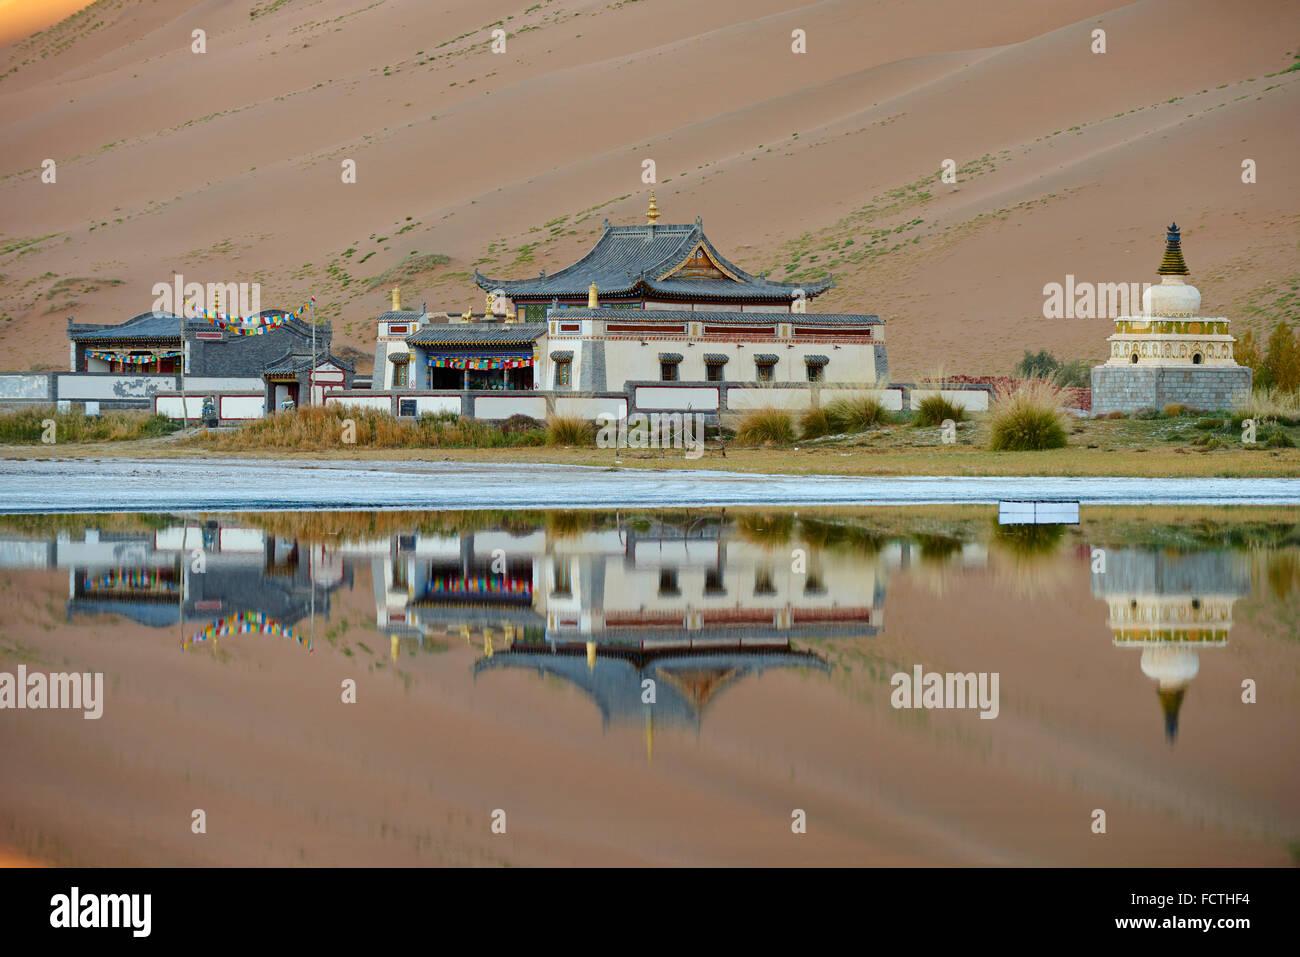 China, Innere Mongolei, Badain Jaran Wüste, Gobi Wüste, mongolischen Kloster Badain Jilin Stockbild